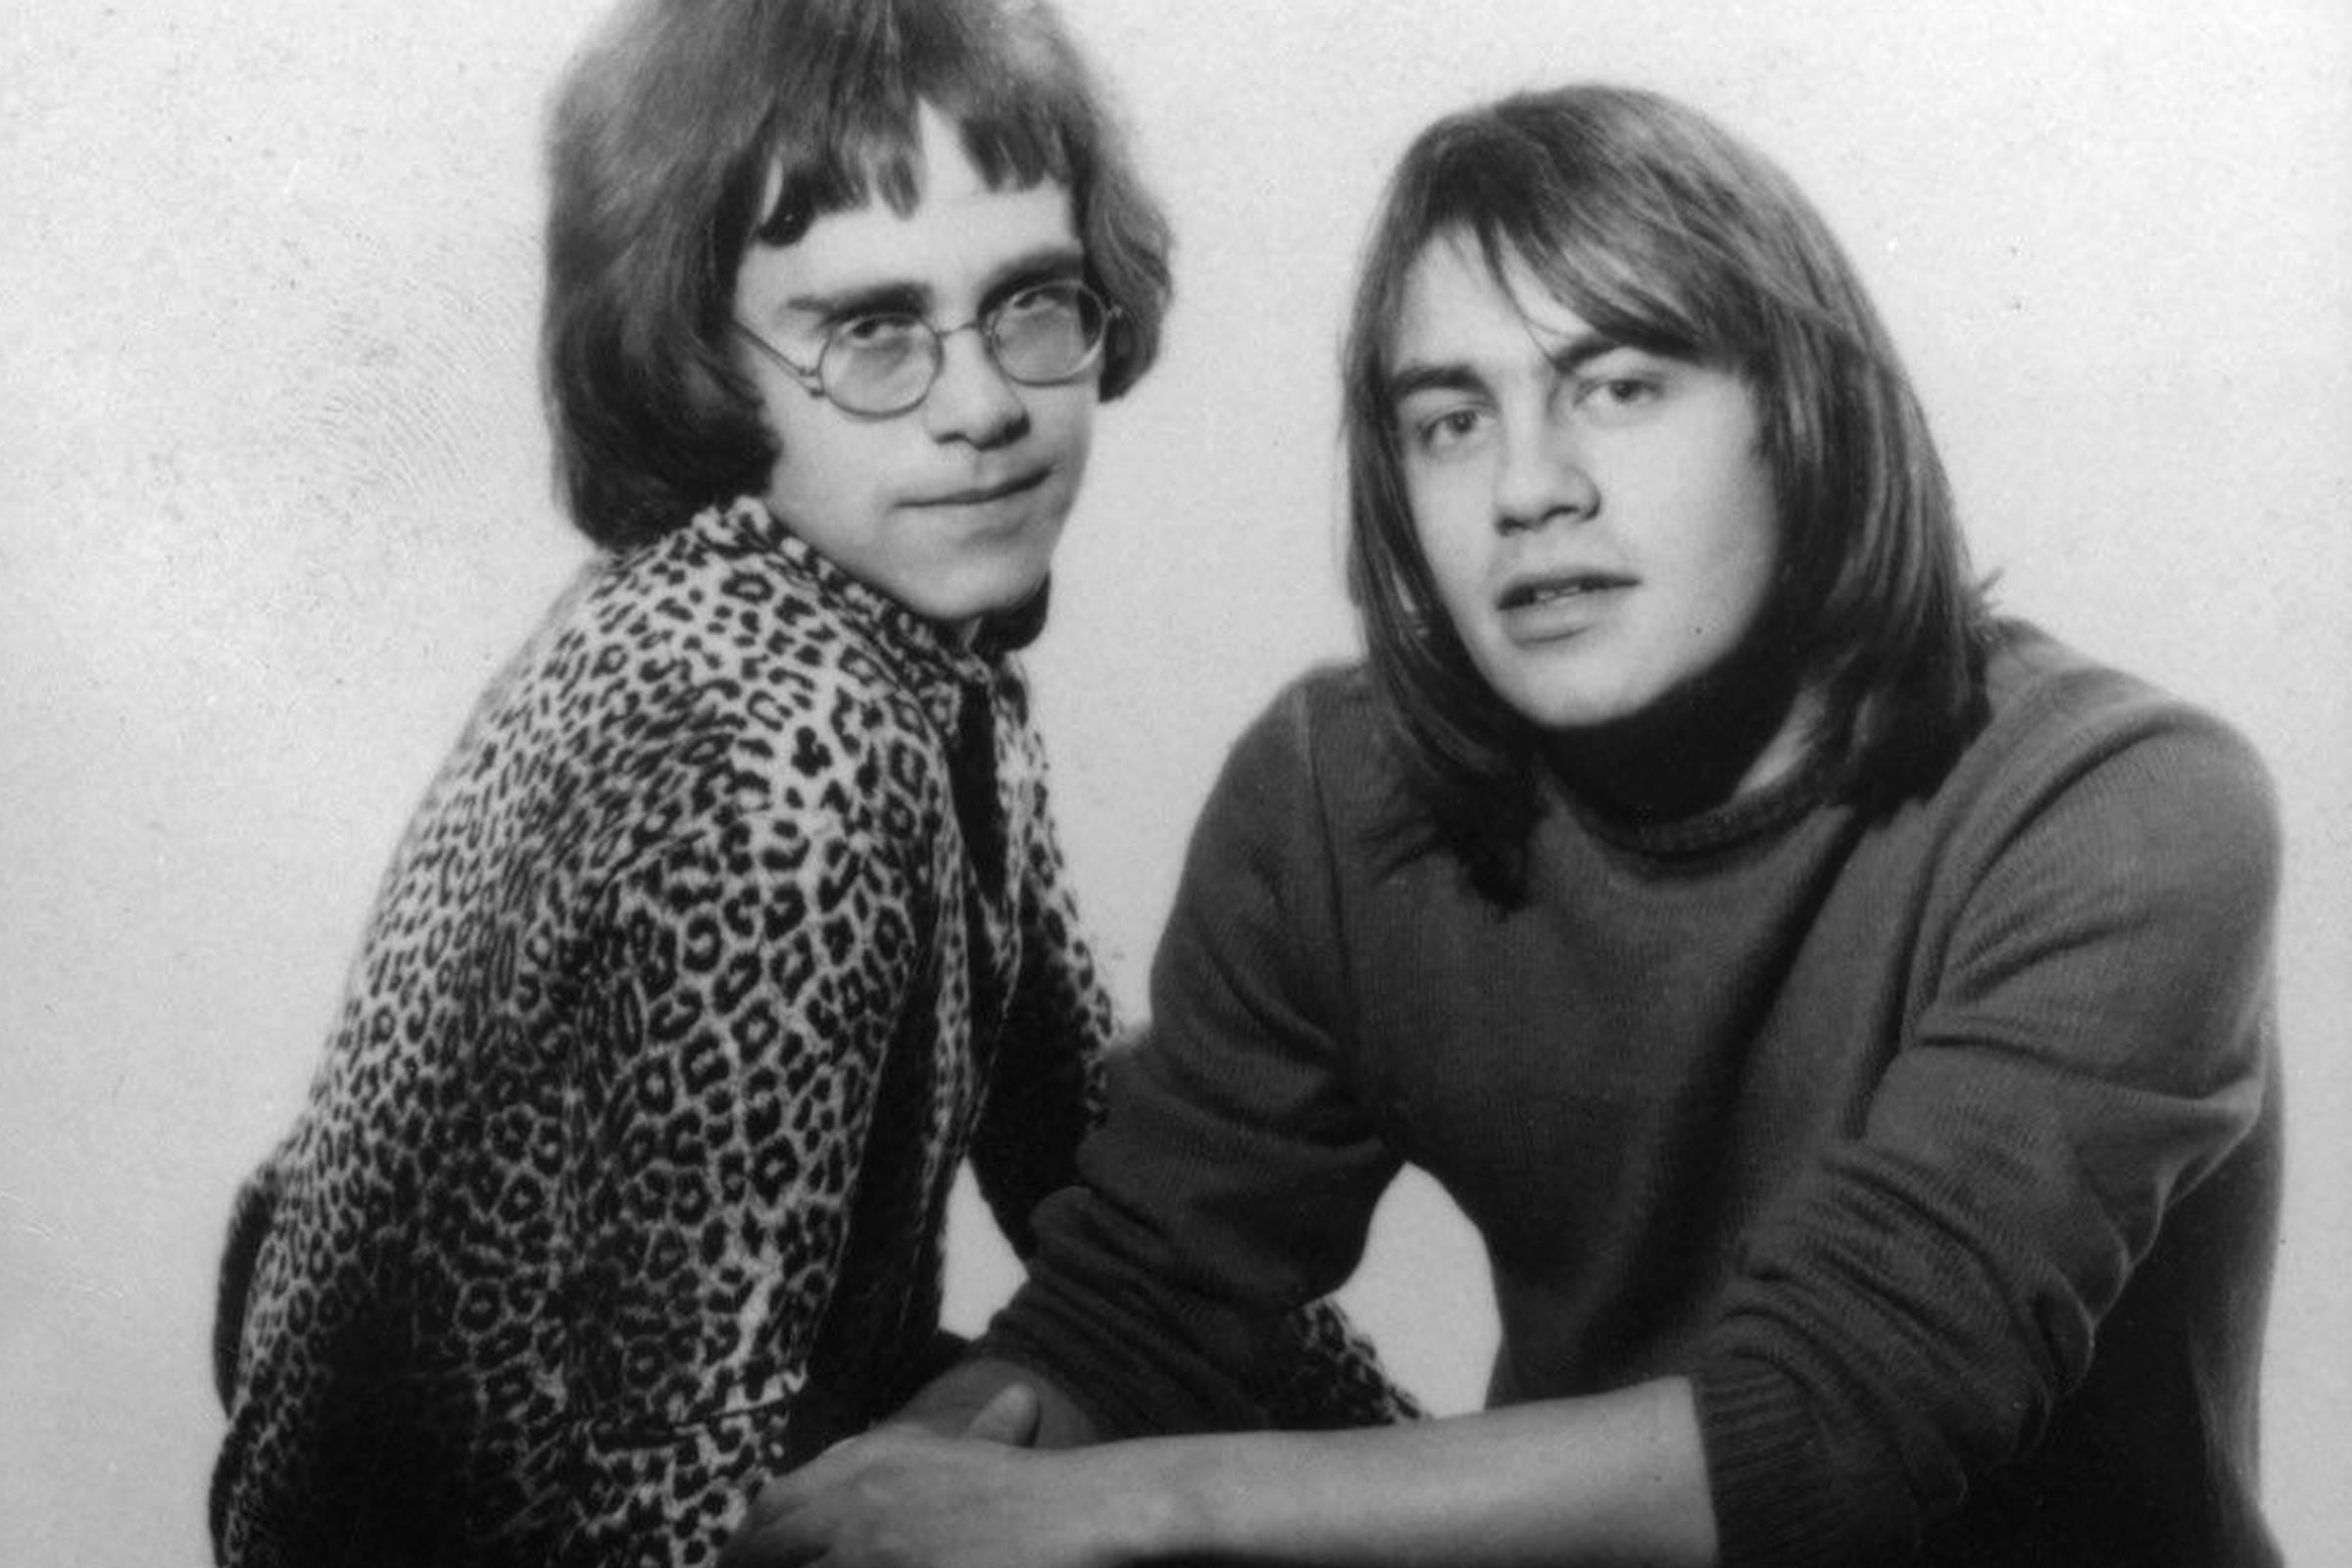 Elton John (left) with Bernie Taupin, 1968